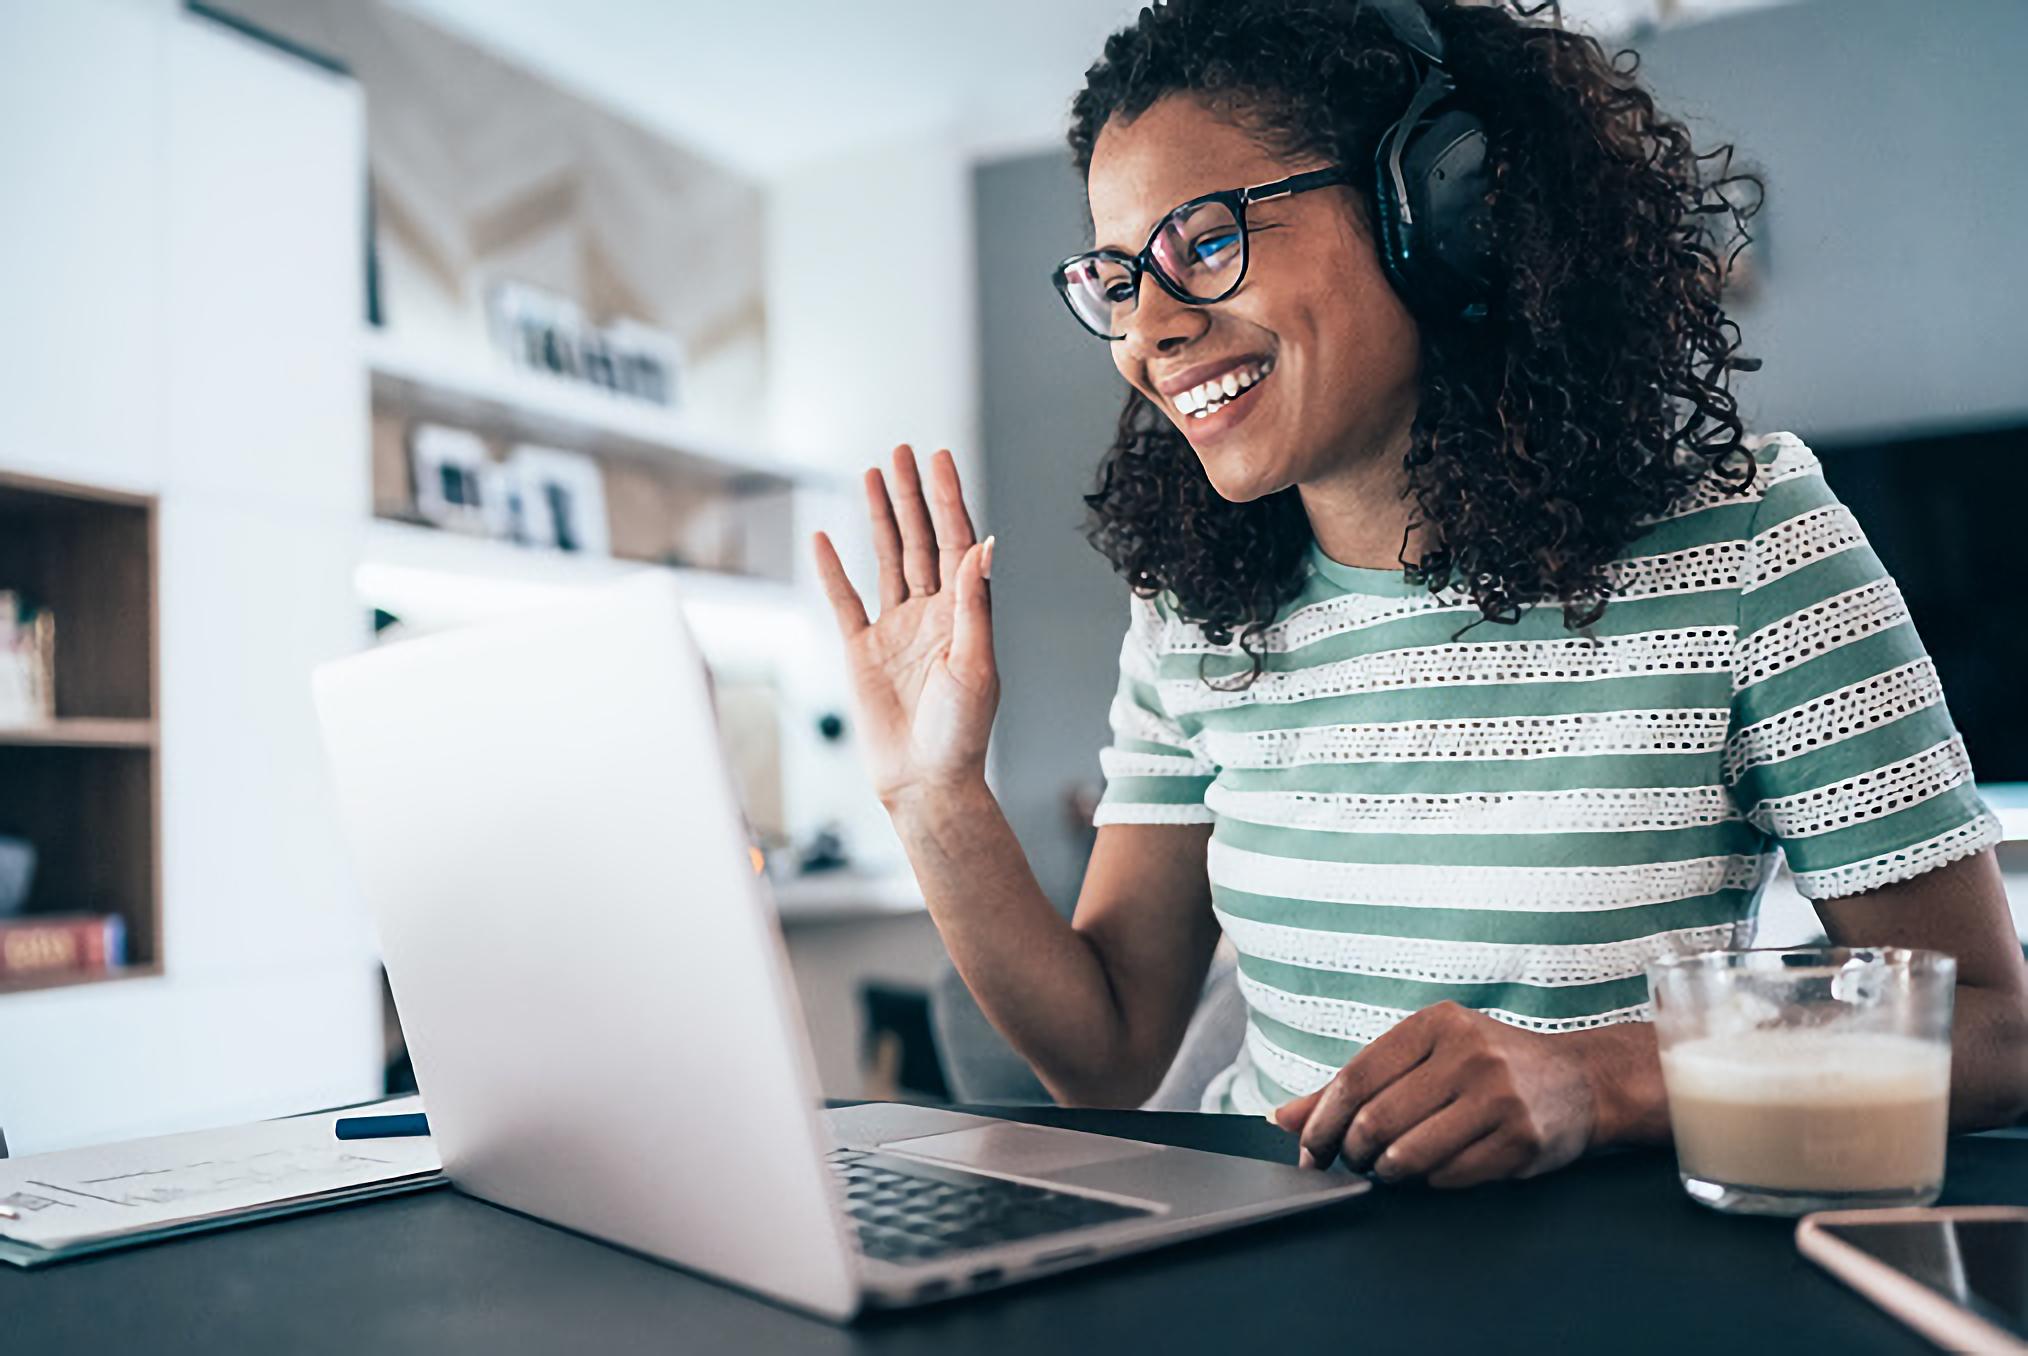 Woman presenting webinar in front of laptop